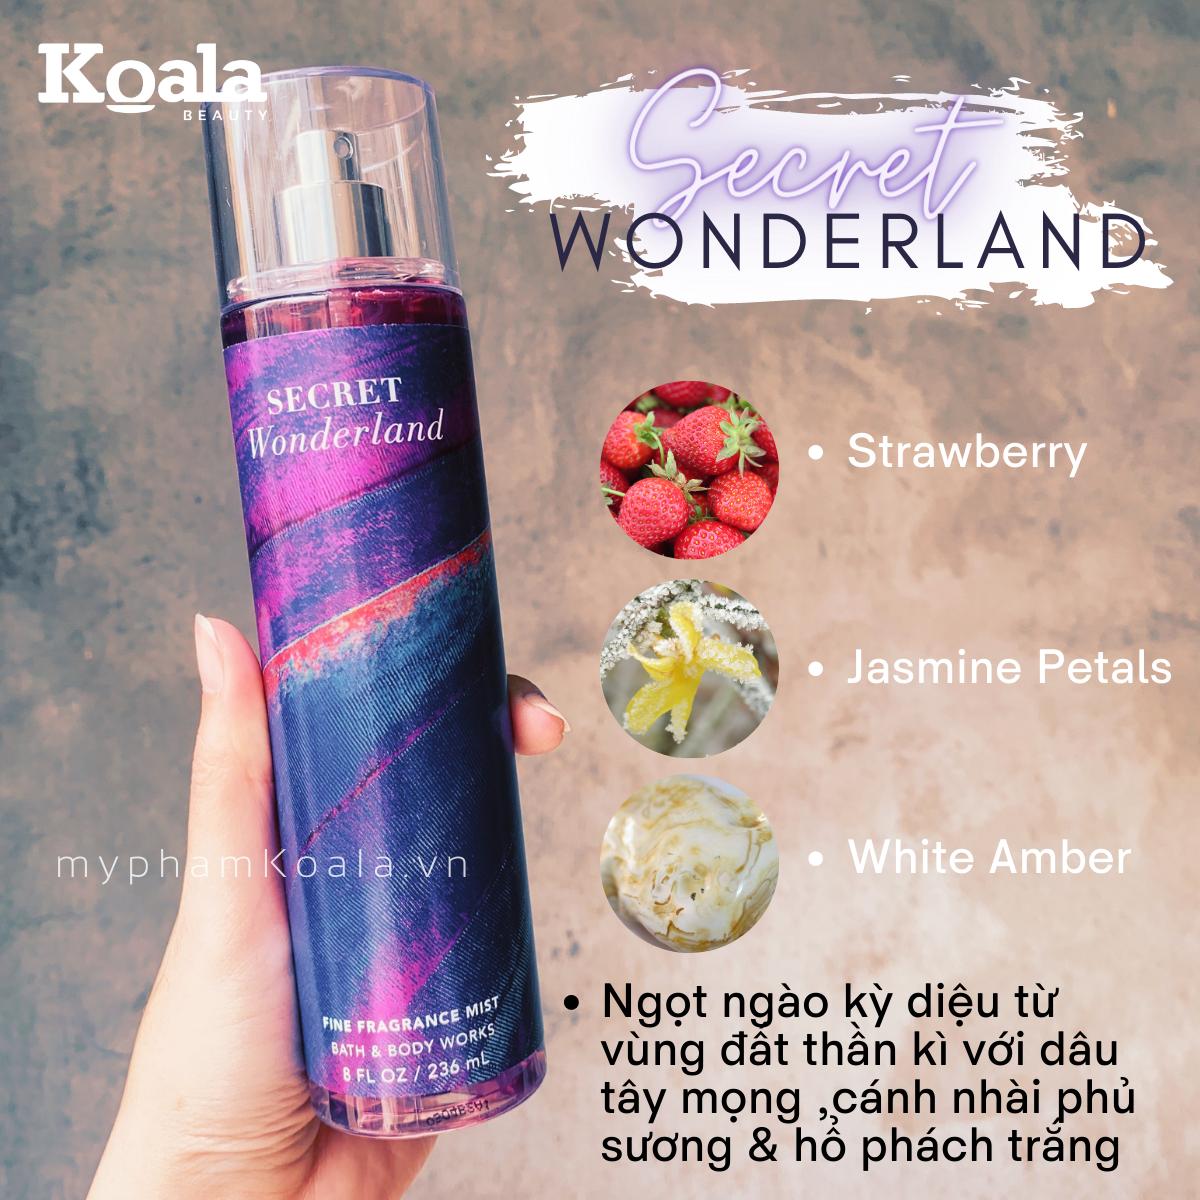 Xịt Body Bath & Body Works SECRET WONDERLAND Fine Fragrance Mist